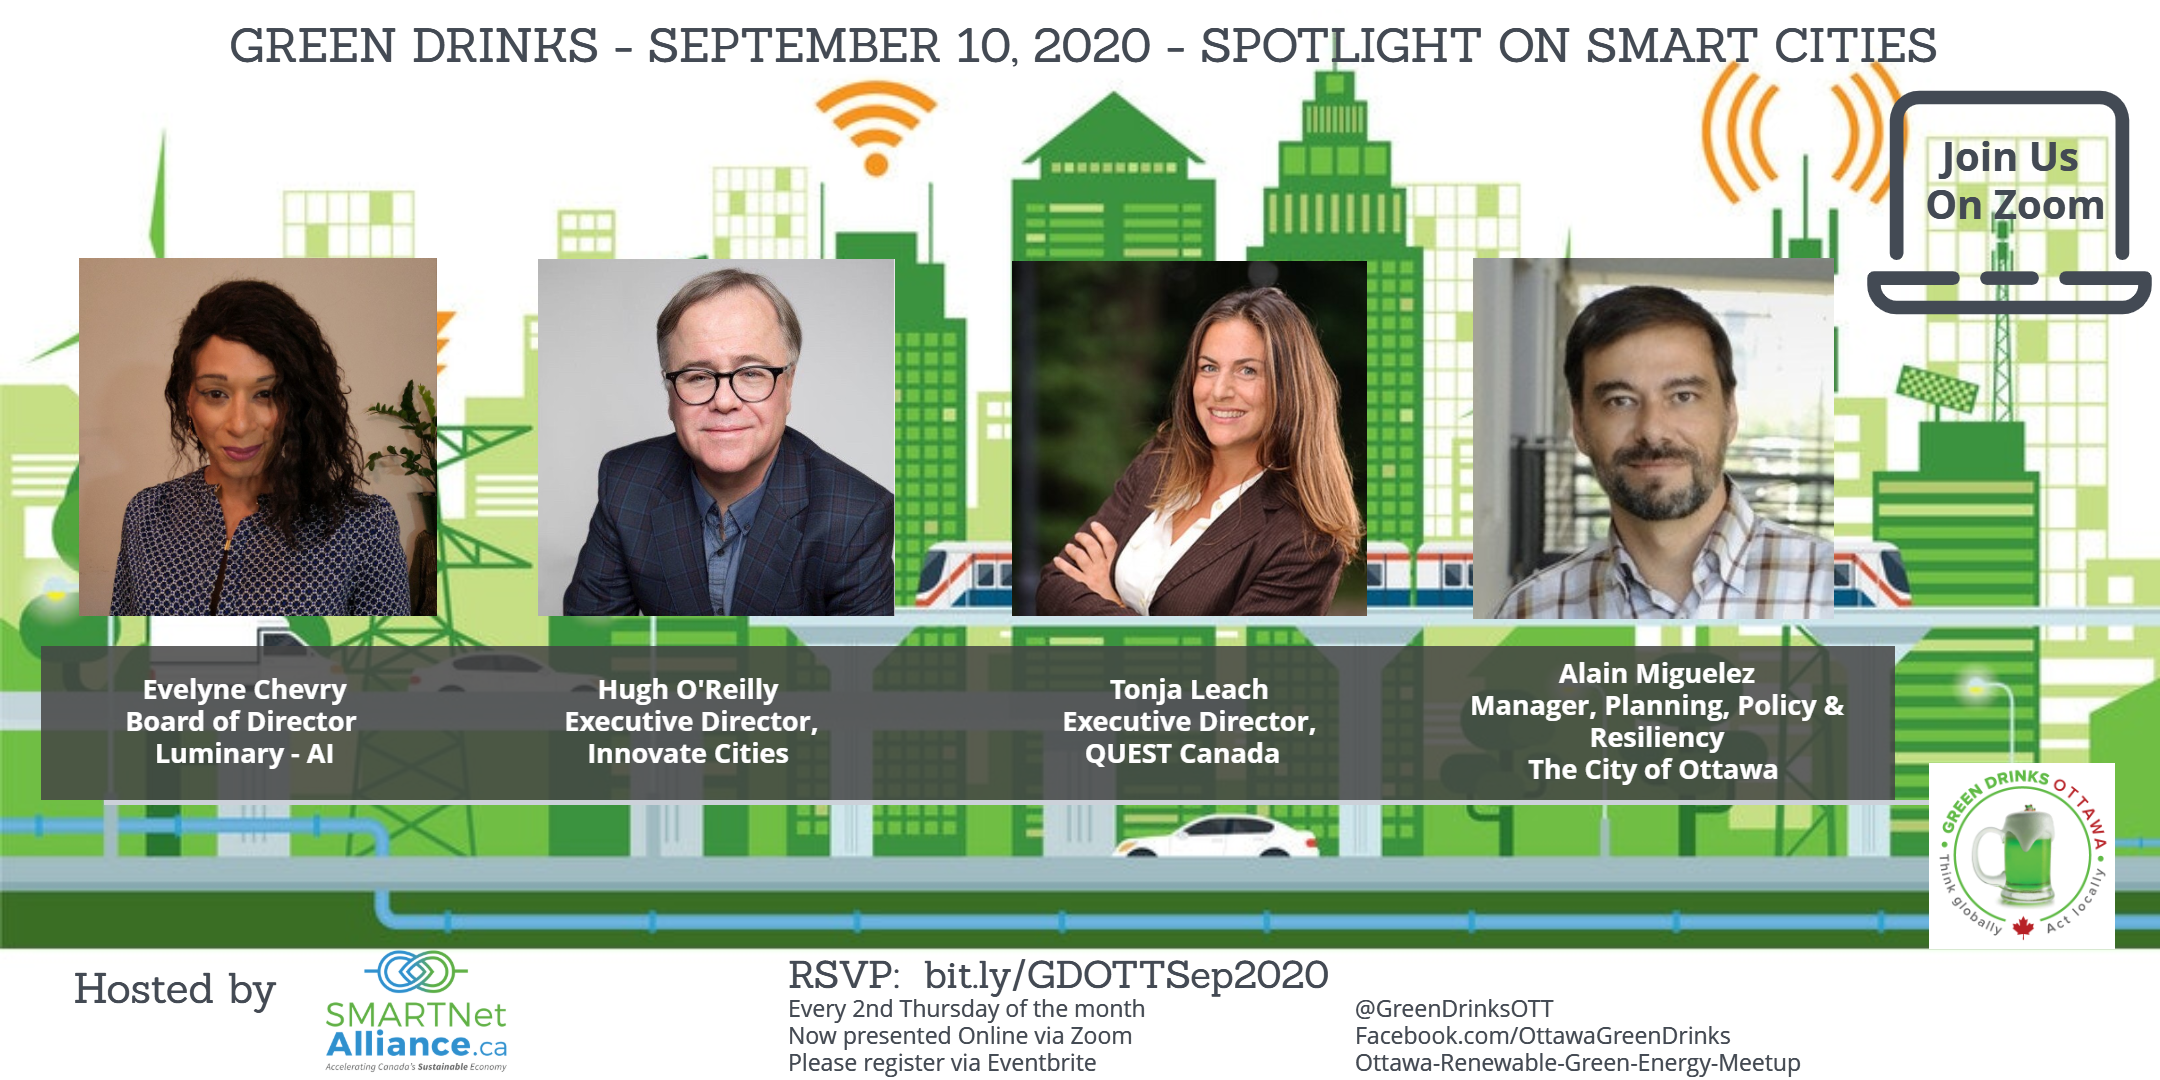 Green Drinks September On Zoom - Spotlight on Smart Cities